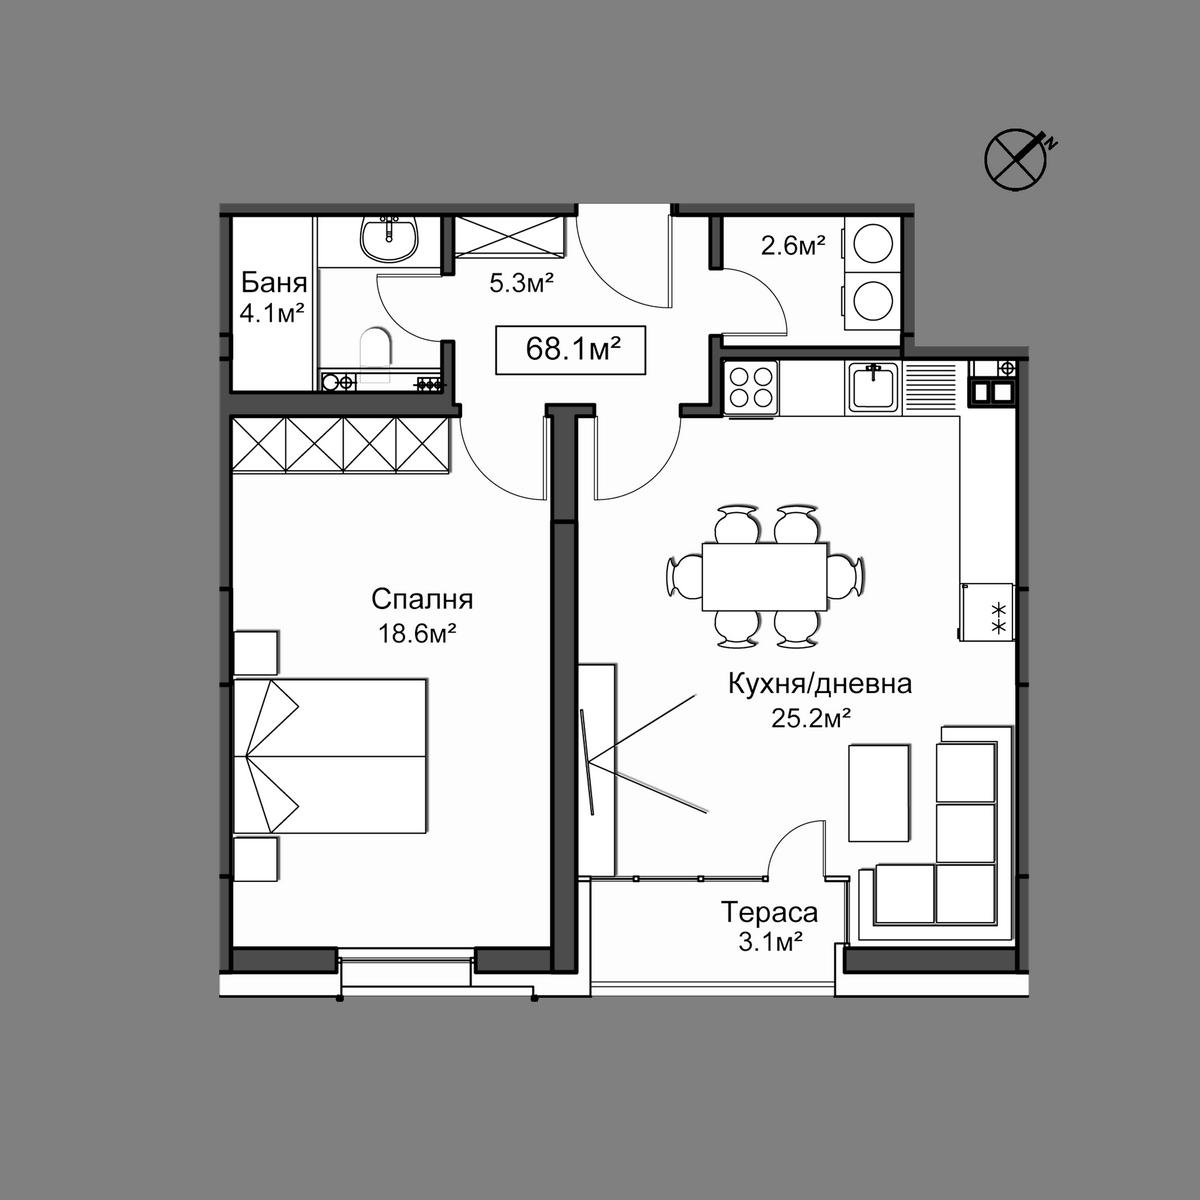 Продава апартамент ново строителство - Апартамент 14